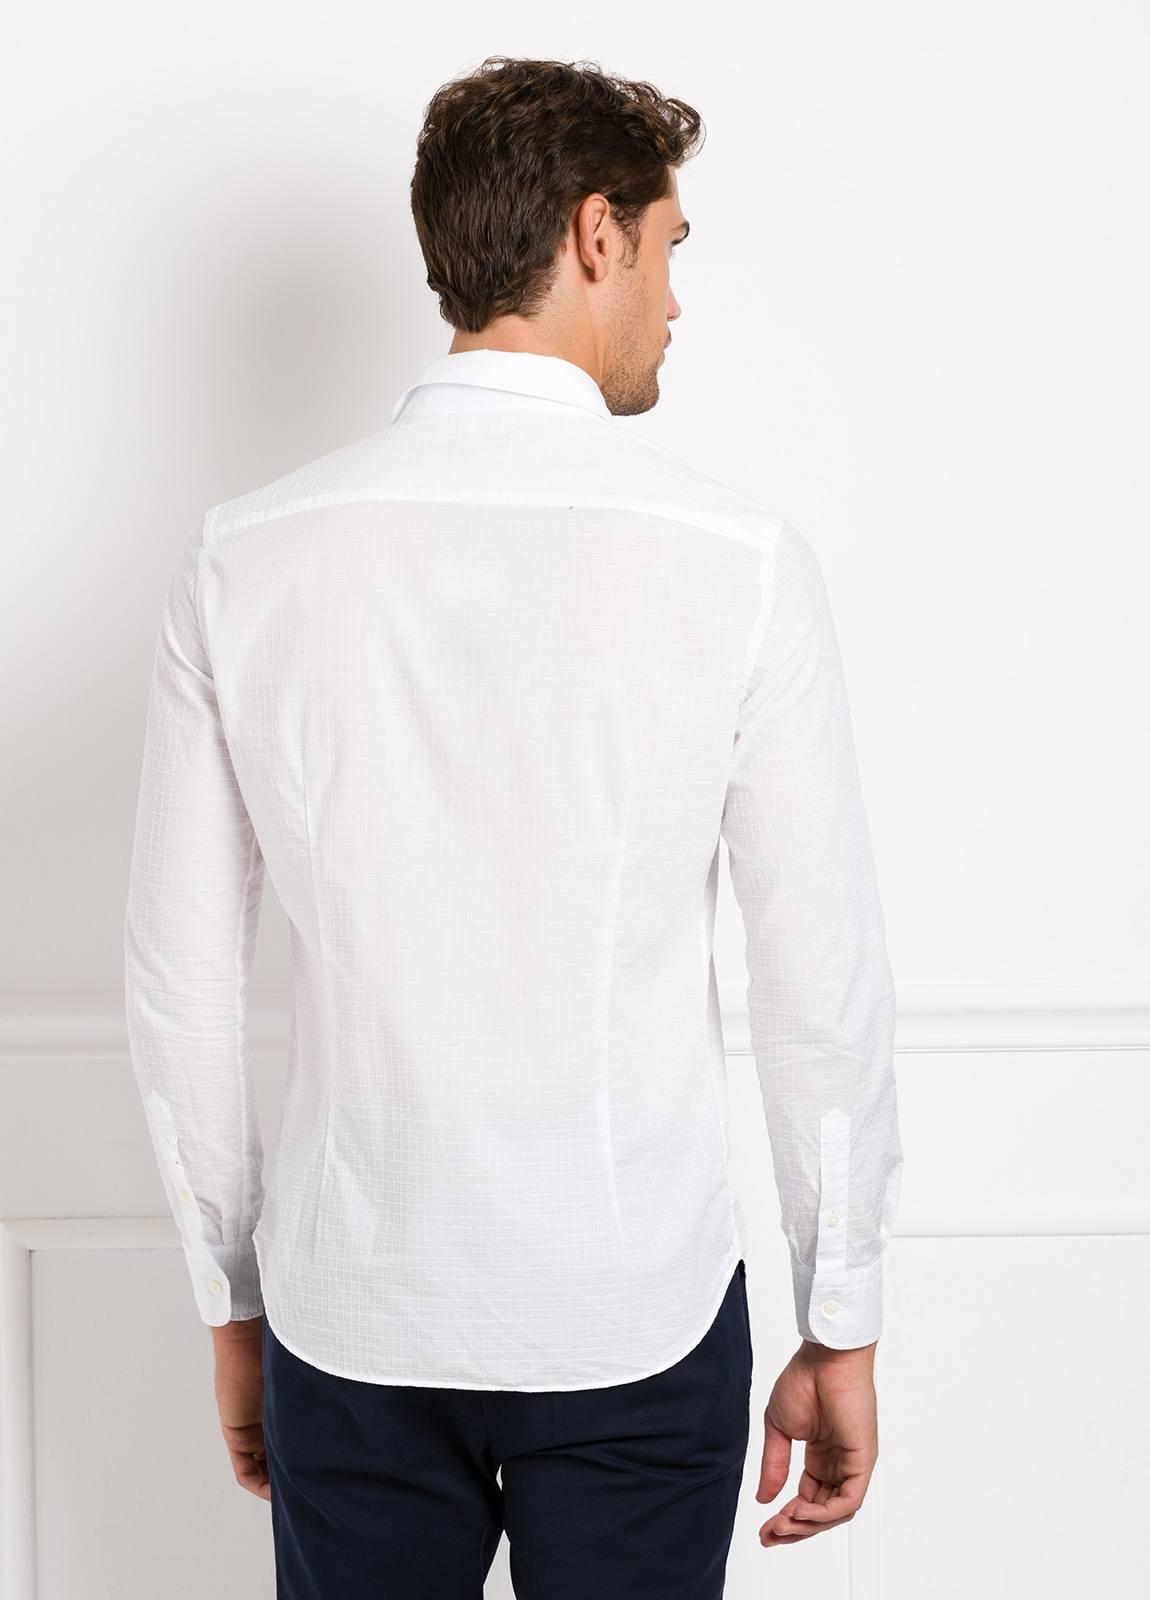 Camisa Leisure Wear SLIM FIT Modelo CAPRI tejido cuadro ventana color blanco, 100% Algodon. - Ítem4